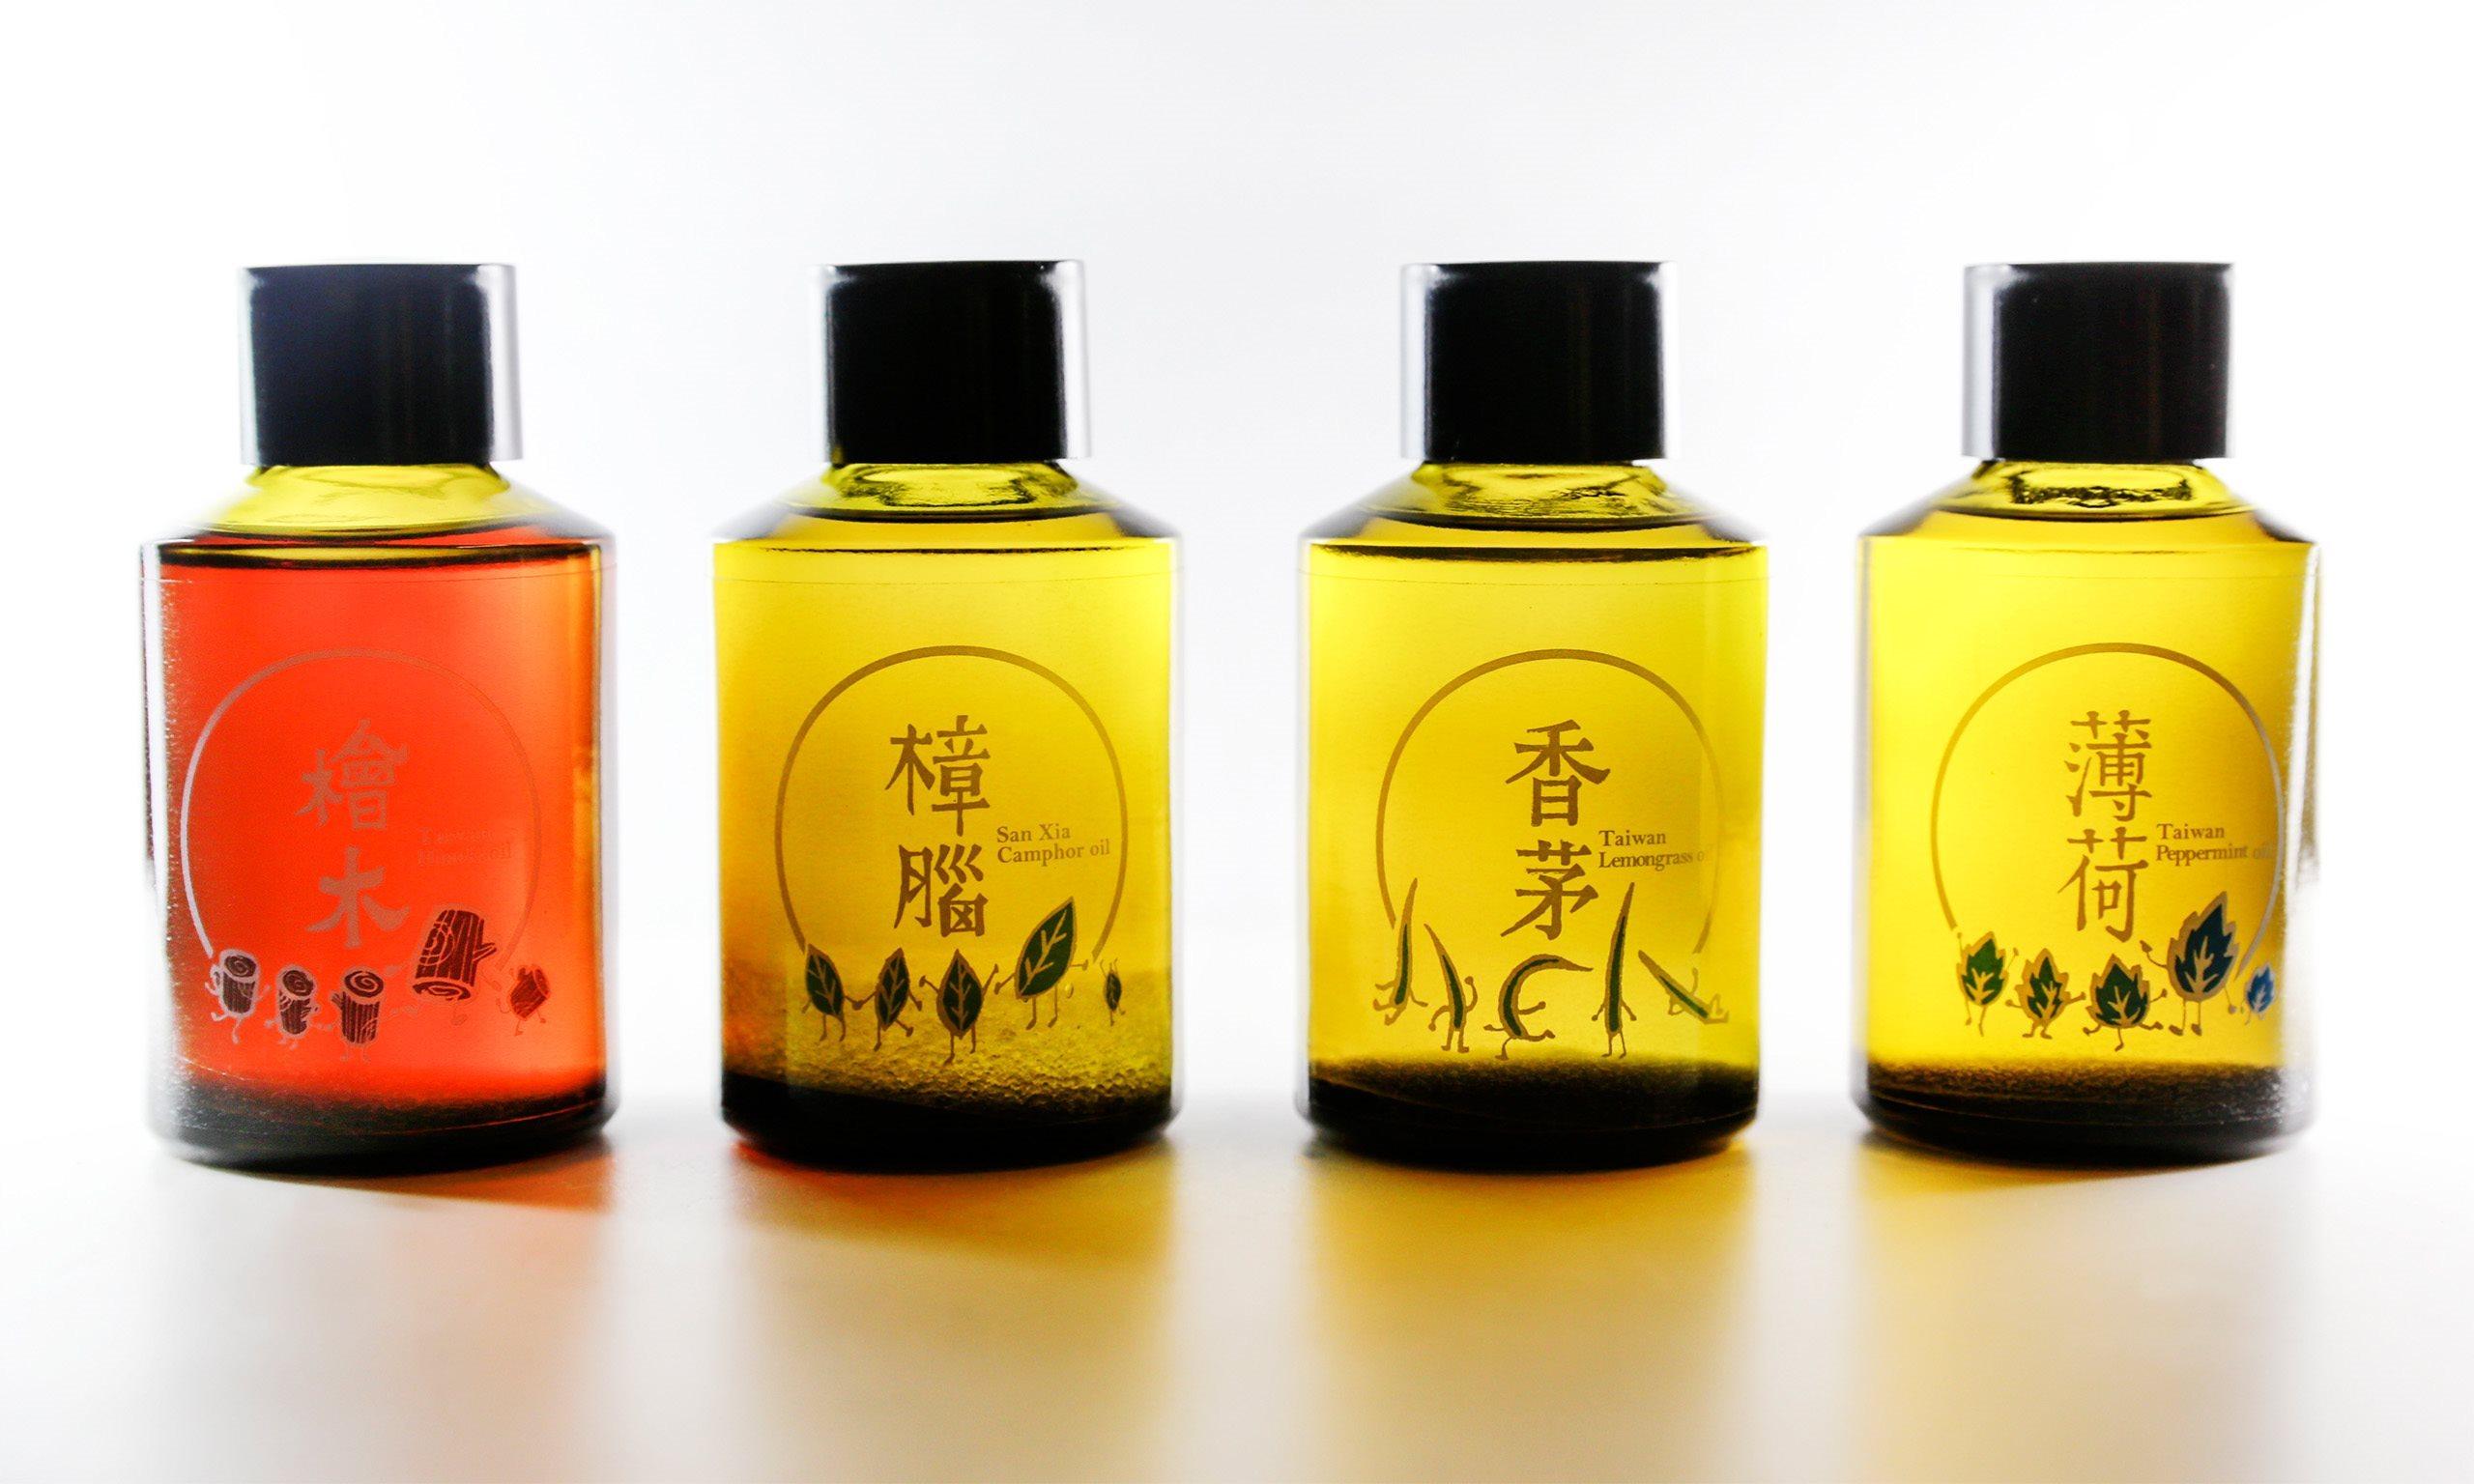 Essential Oil of Taiwan - Taiwan packaging design